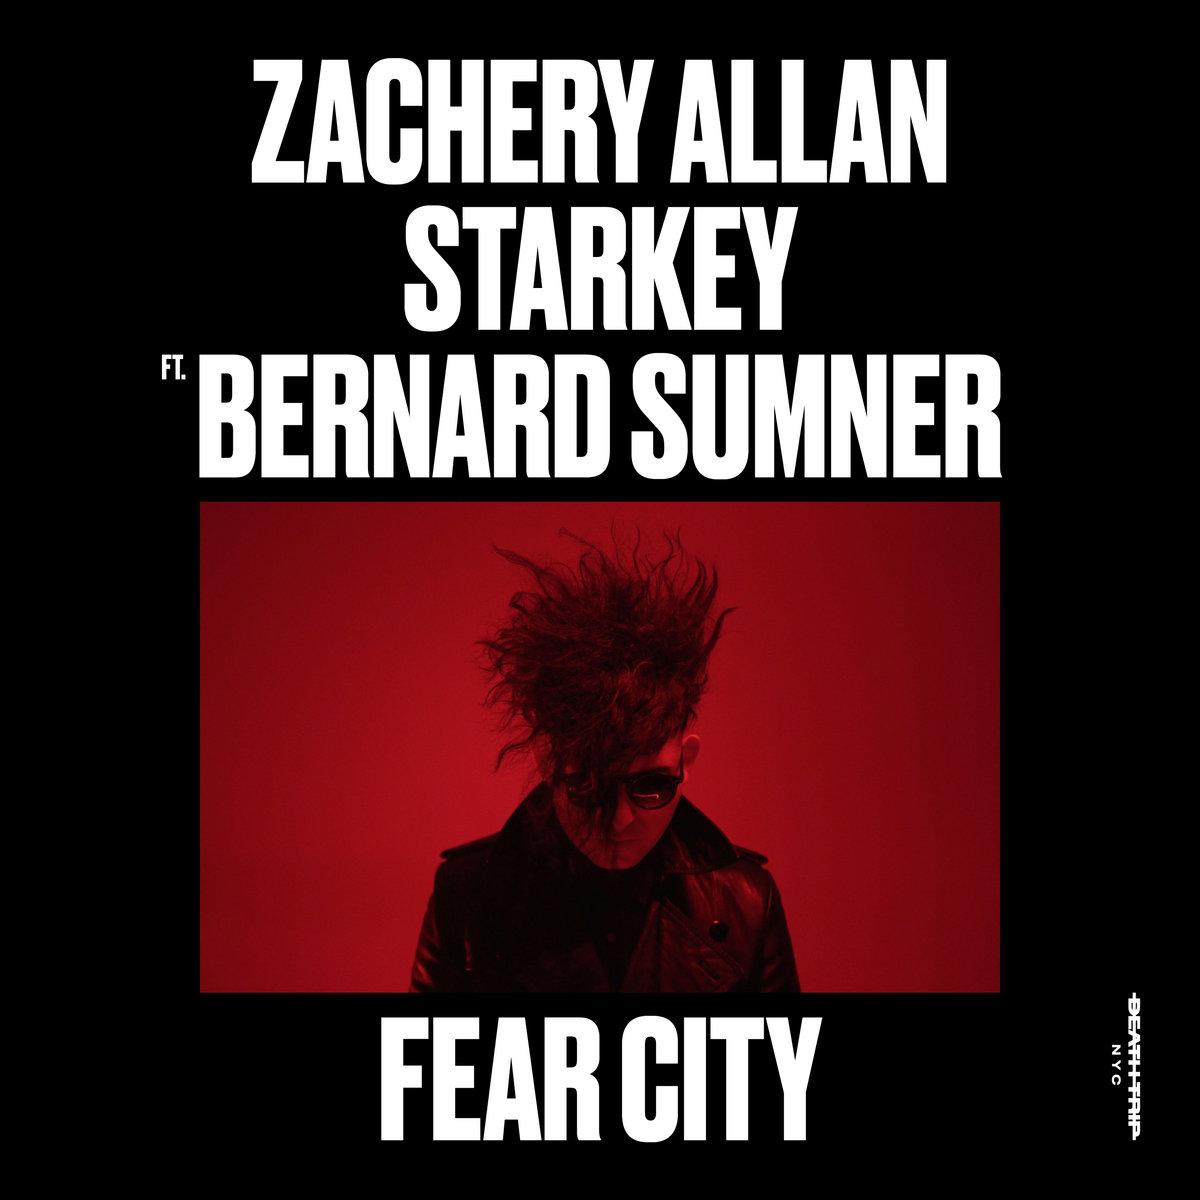 News – Zachery Allan Starkey – Fear City